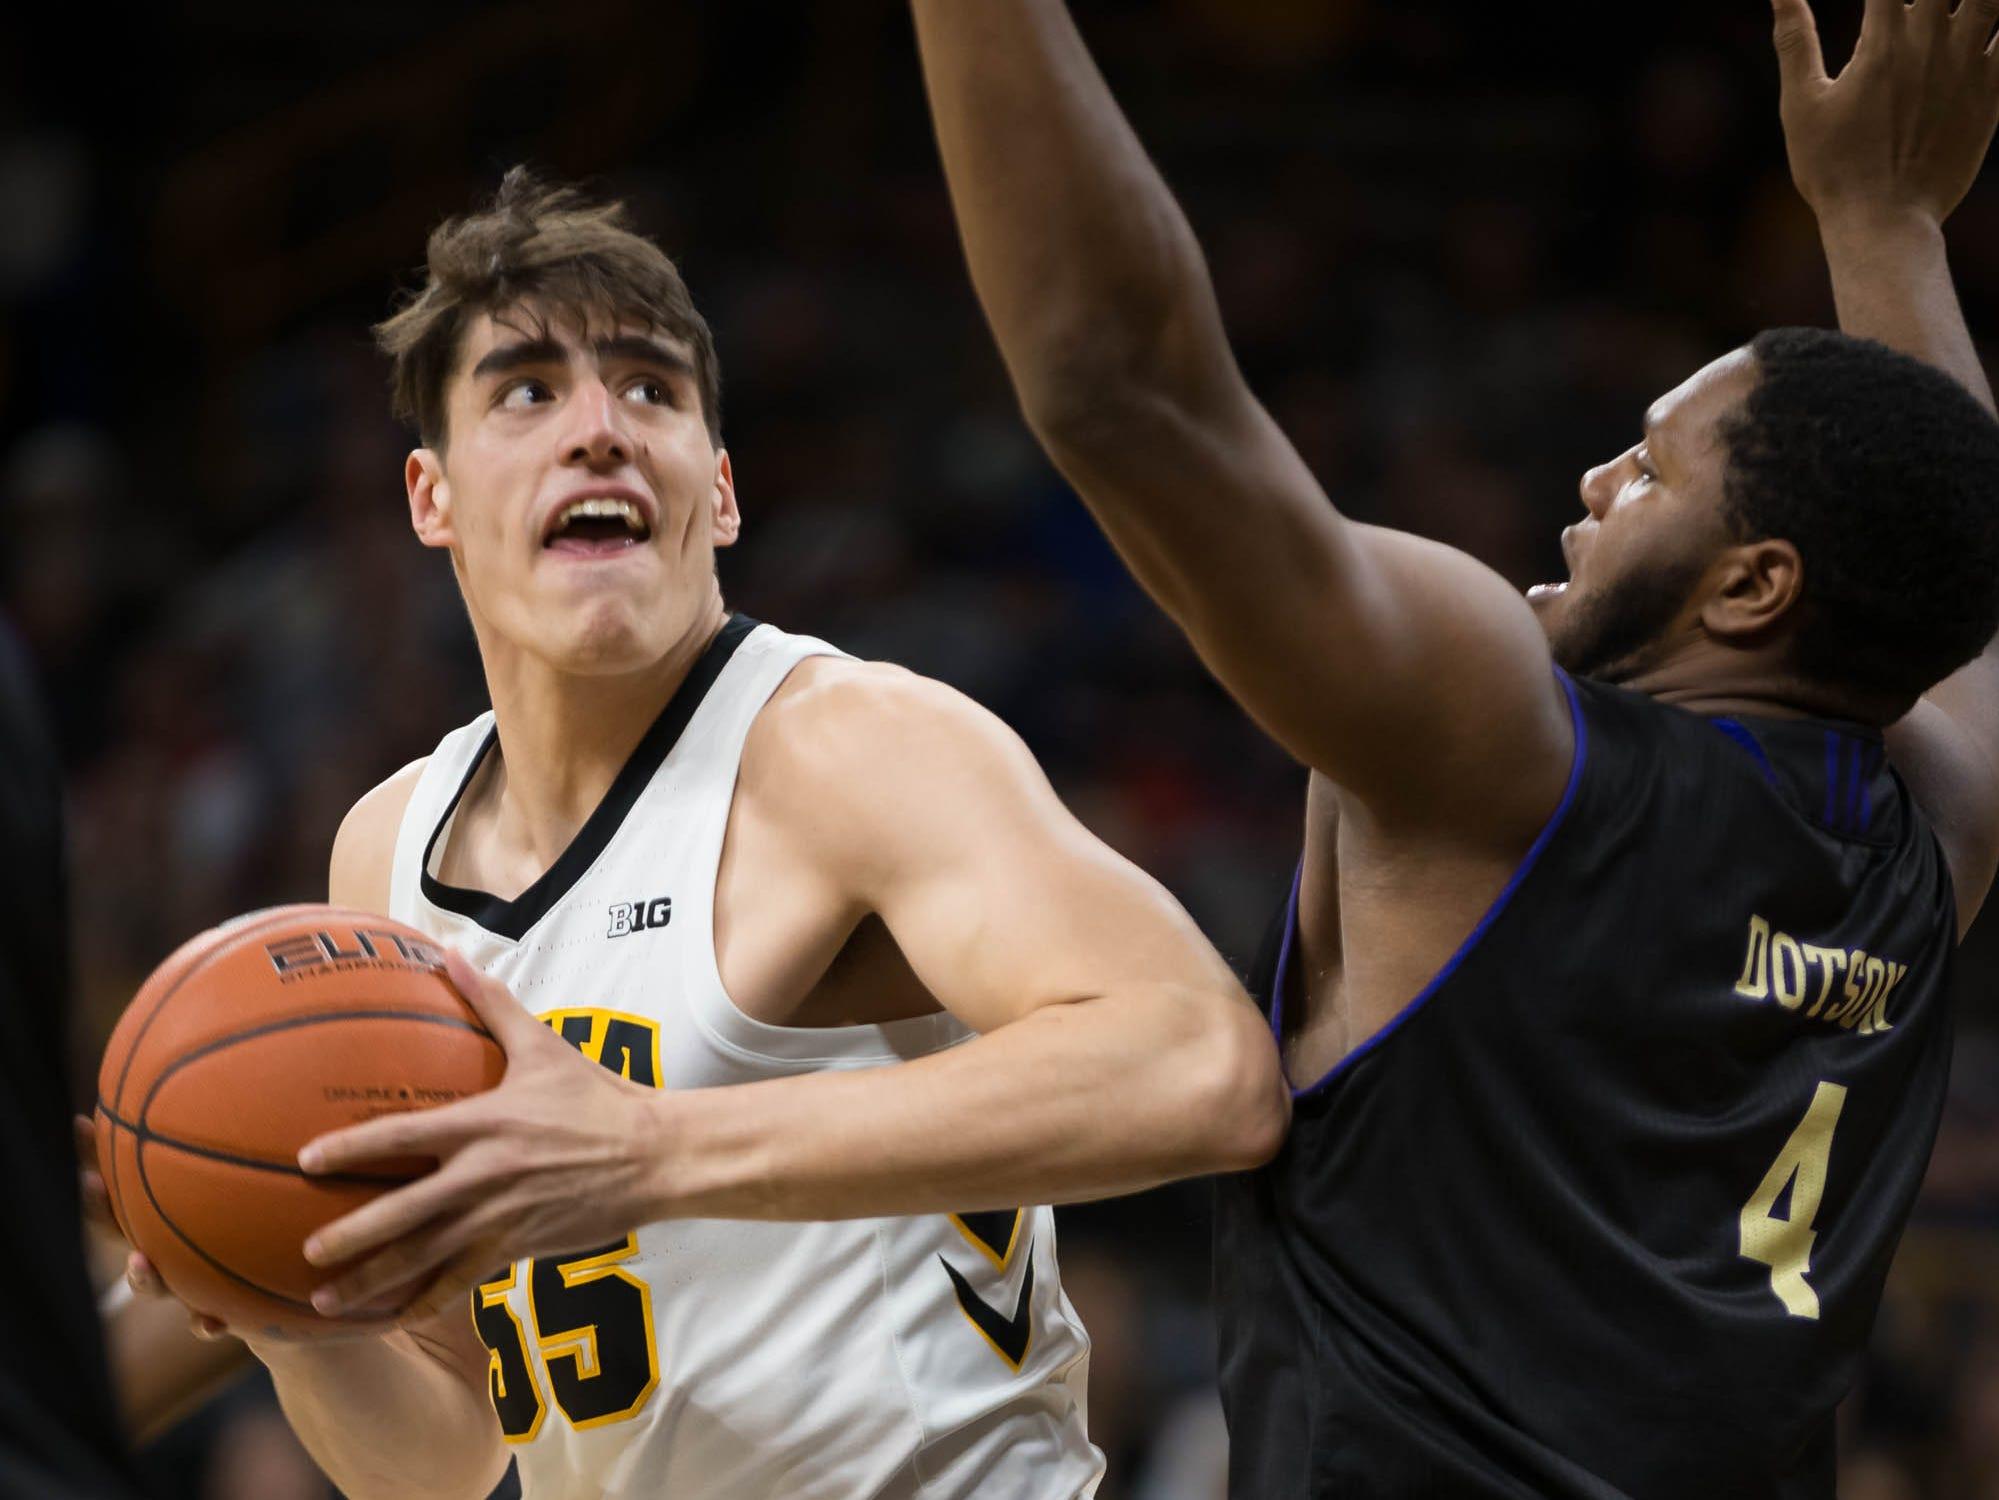 Iowa hoops takeaways: Winning streak coincides with Garza's return; an update on Cook